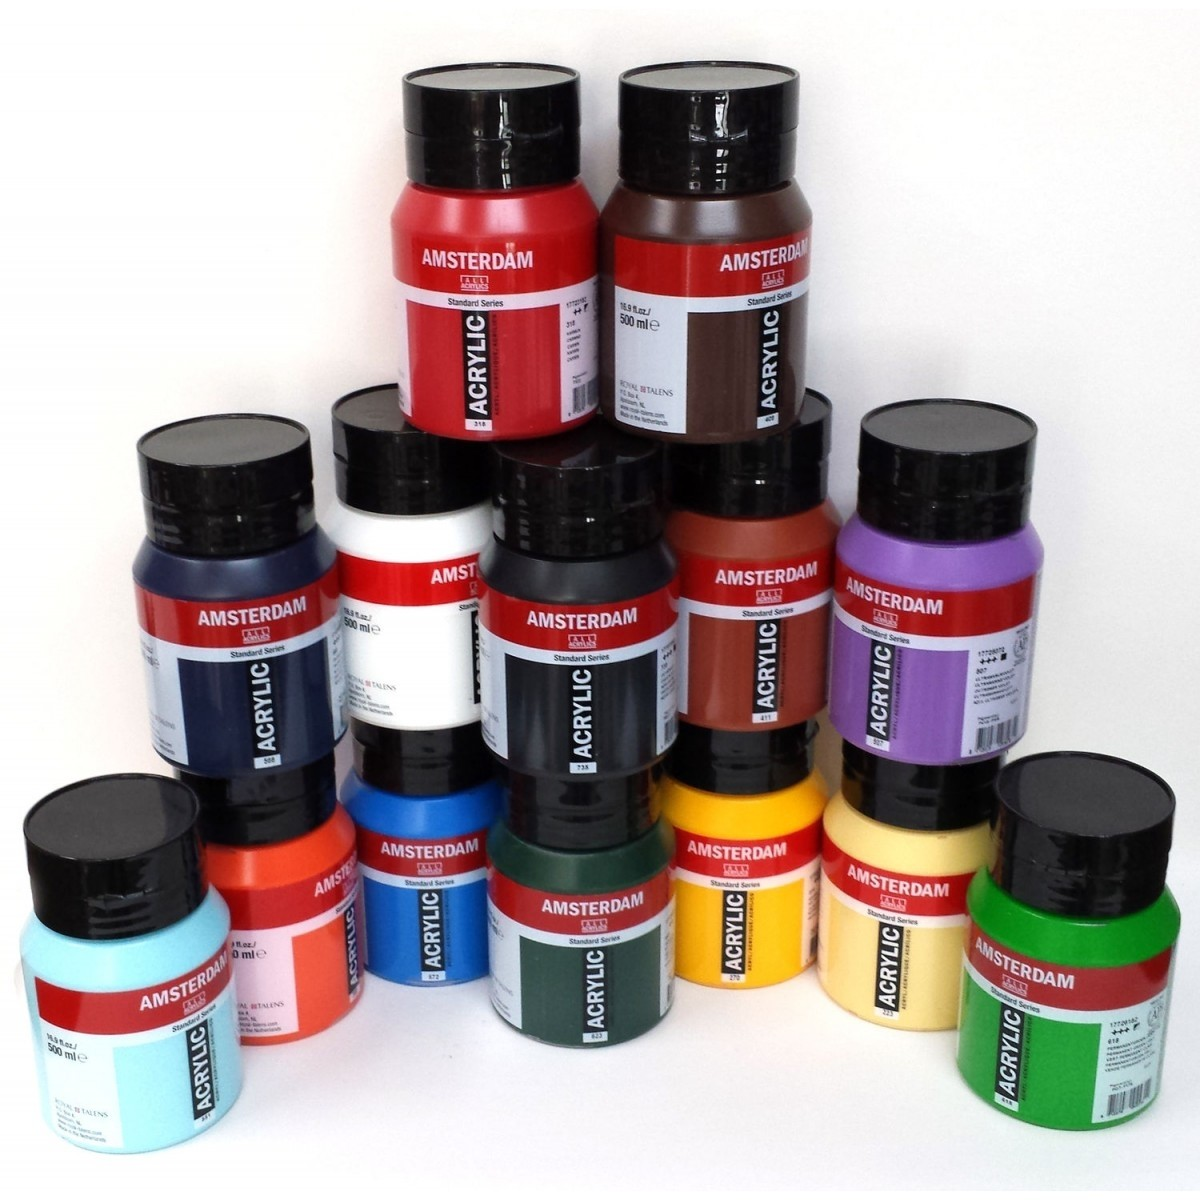 AMSTERDAM akrylmaling - 500 ml. FAST LAVPRIS